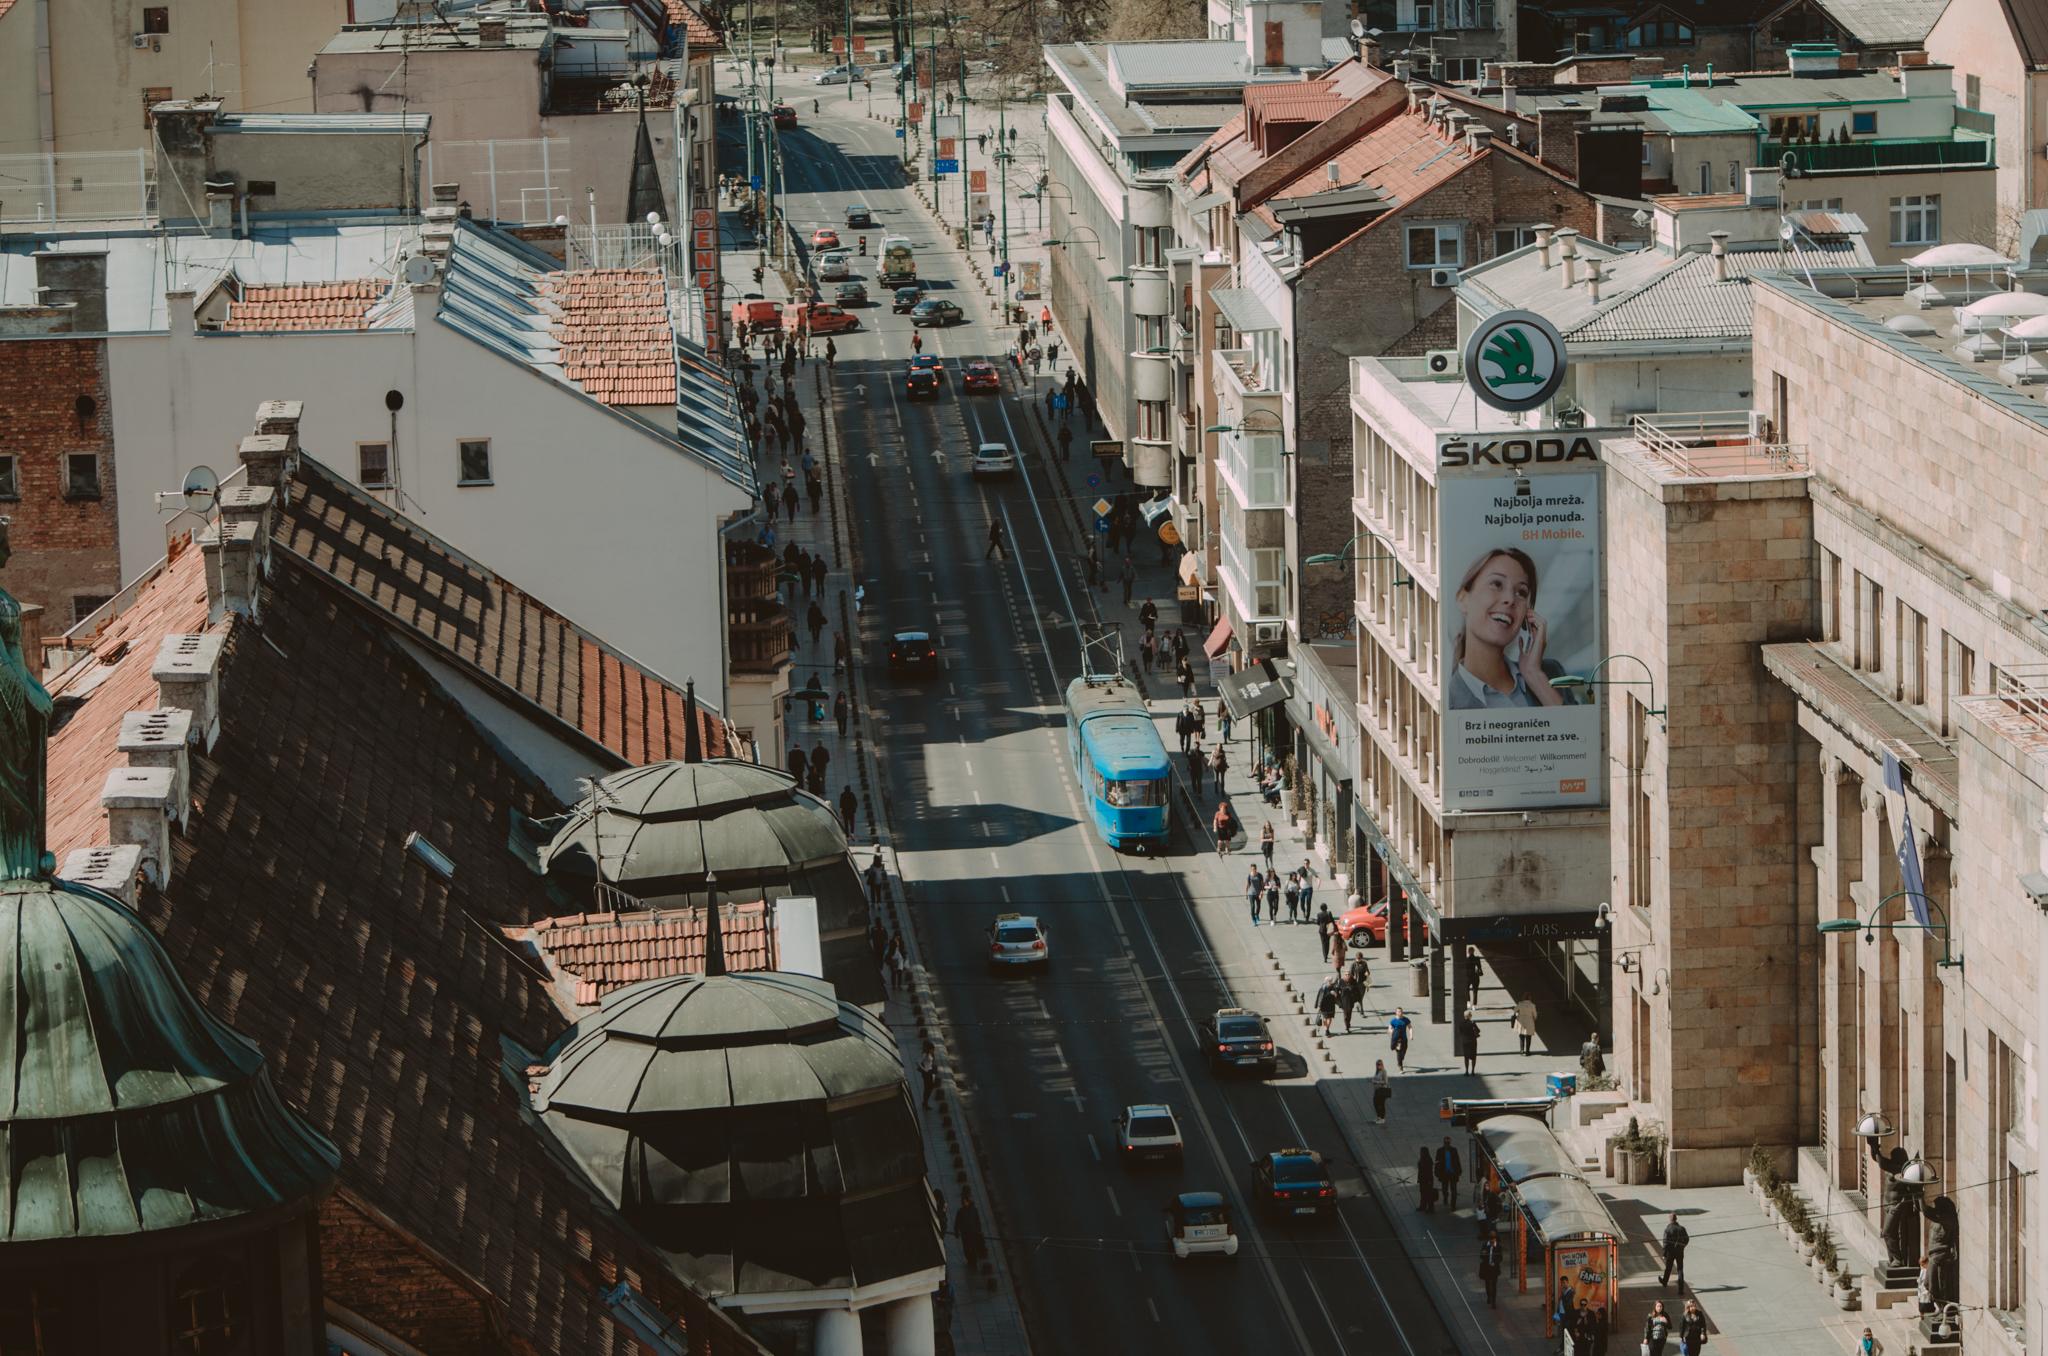 hotel-hecco-deluxe-panorama-sarajew0-centrum